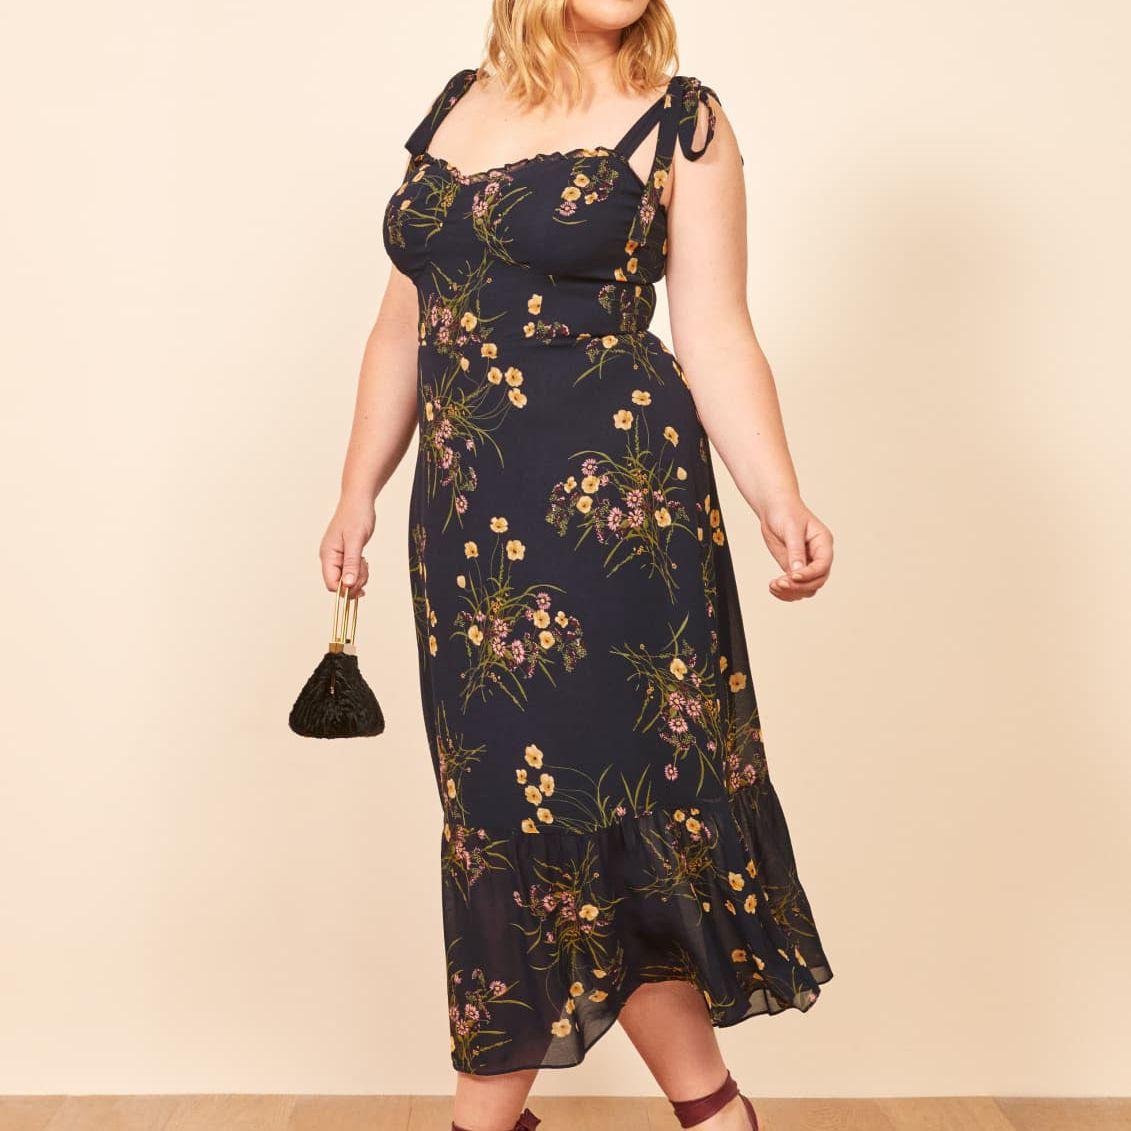 Reformation Nikita Dress, $248